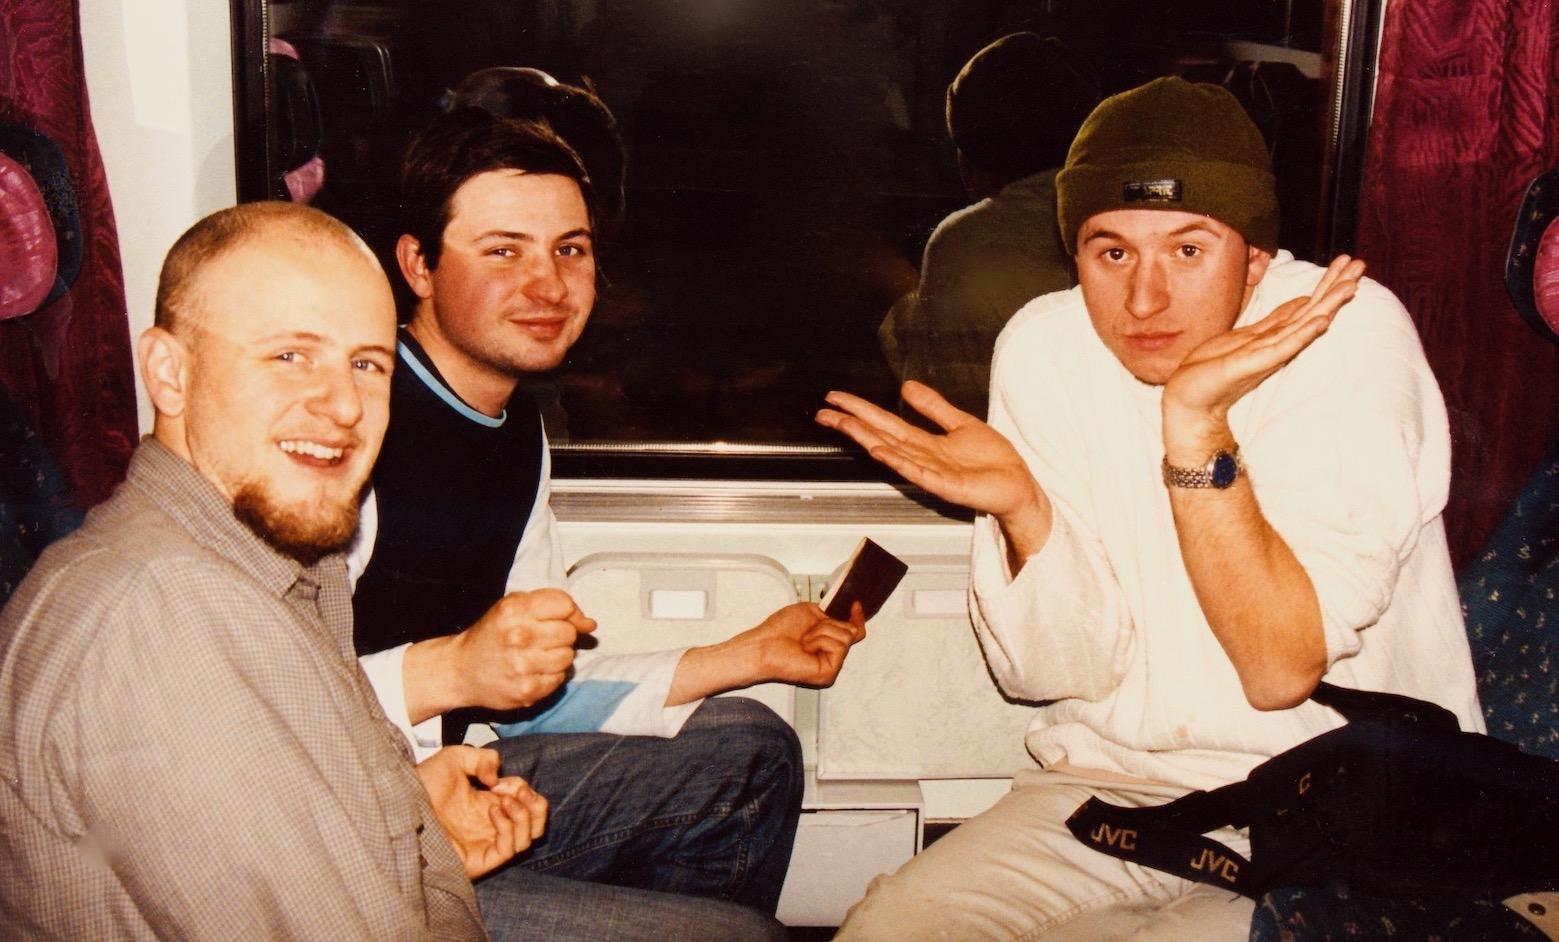 The train from Prague to Bratislava December 2002.